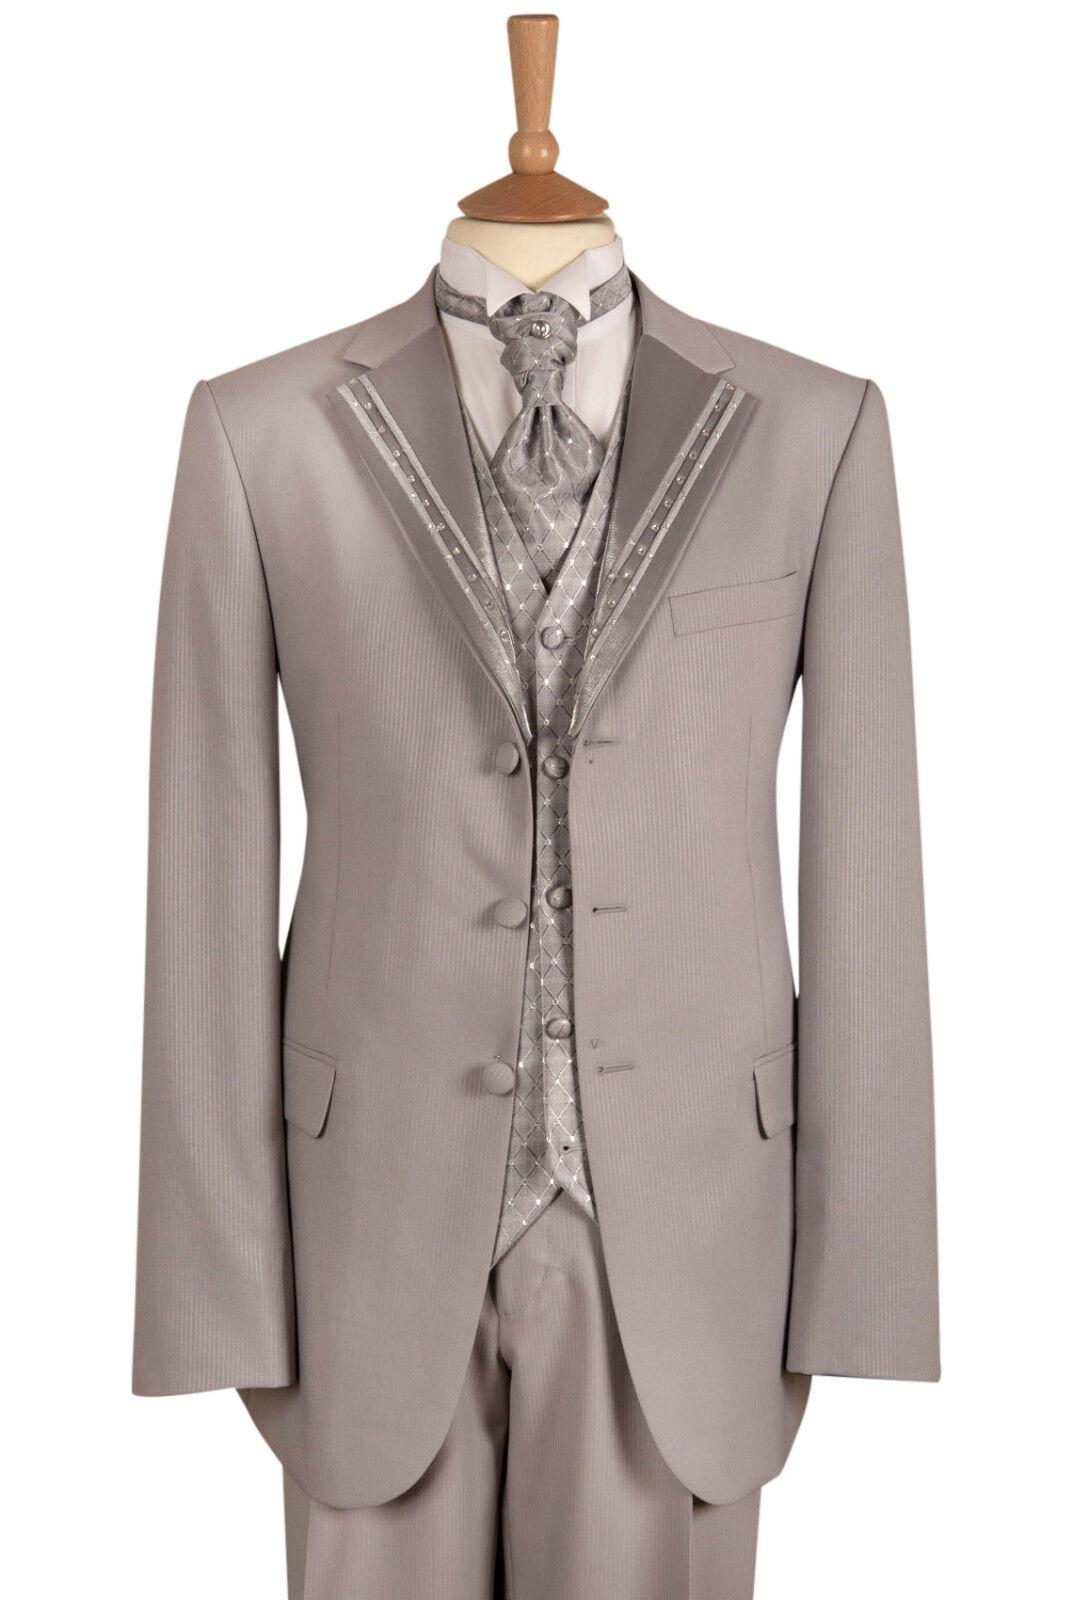 Uomo STILISTA ITALIANO grigio argento 4 pezzi Vestito Matrimonio da Matrimonio Vestito 34 36 54 c0ac06